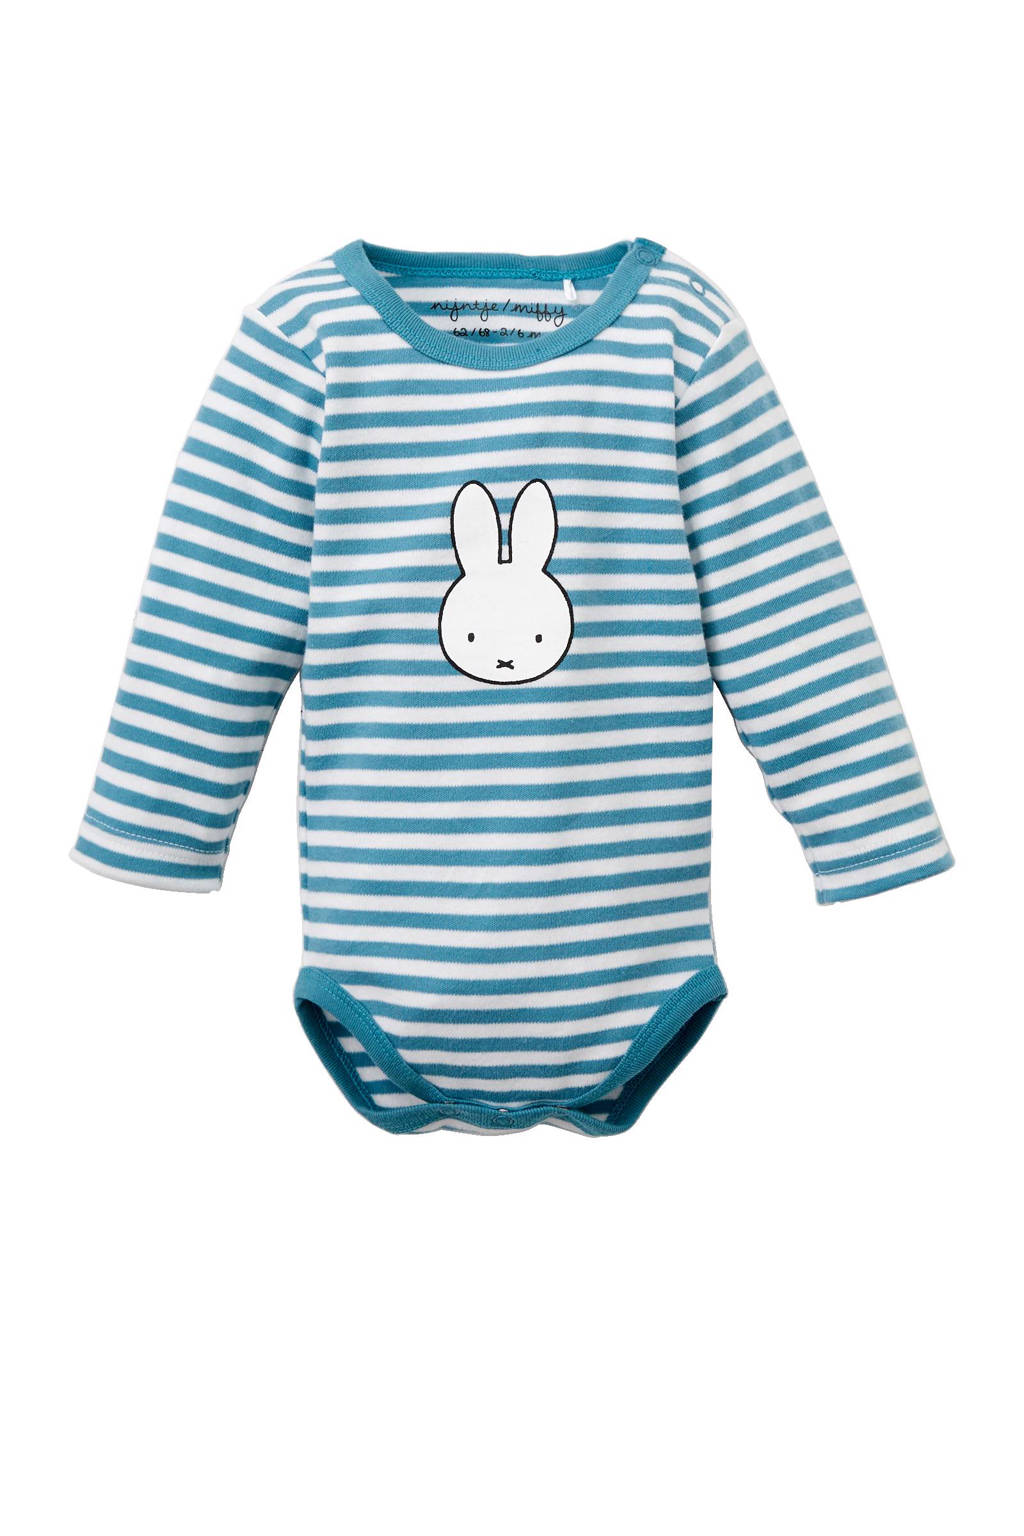 nijntje newborn baby romper, Blauw/wit